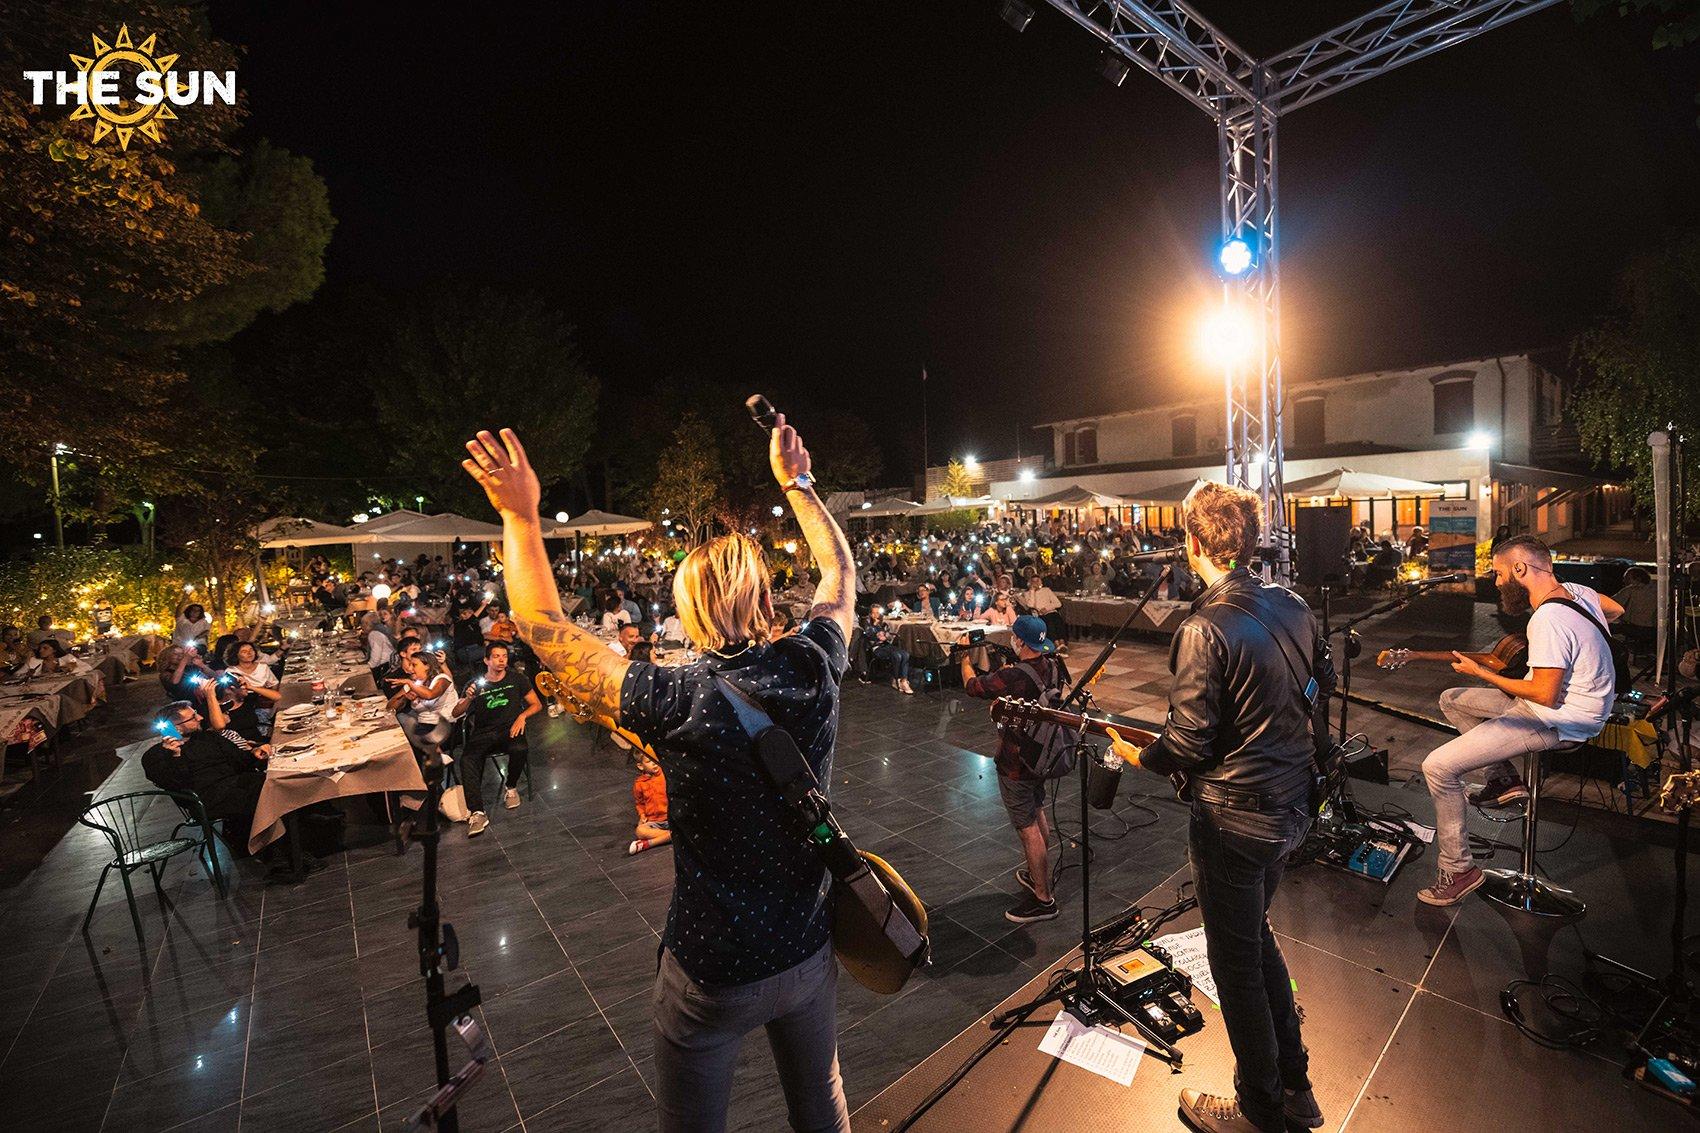 the sun rock band live bellaria